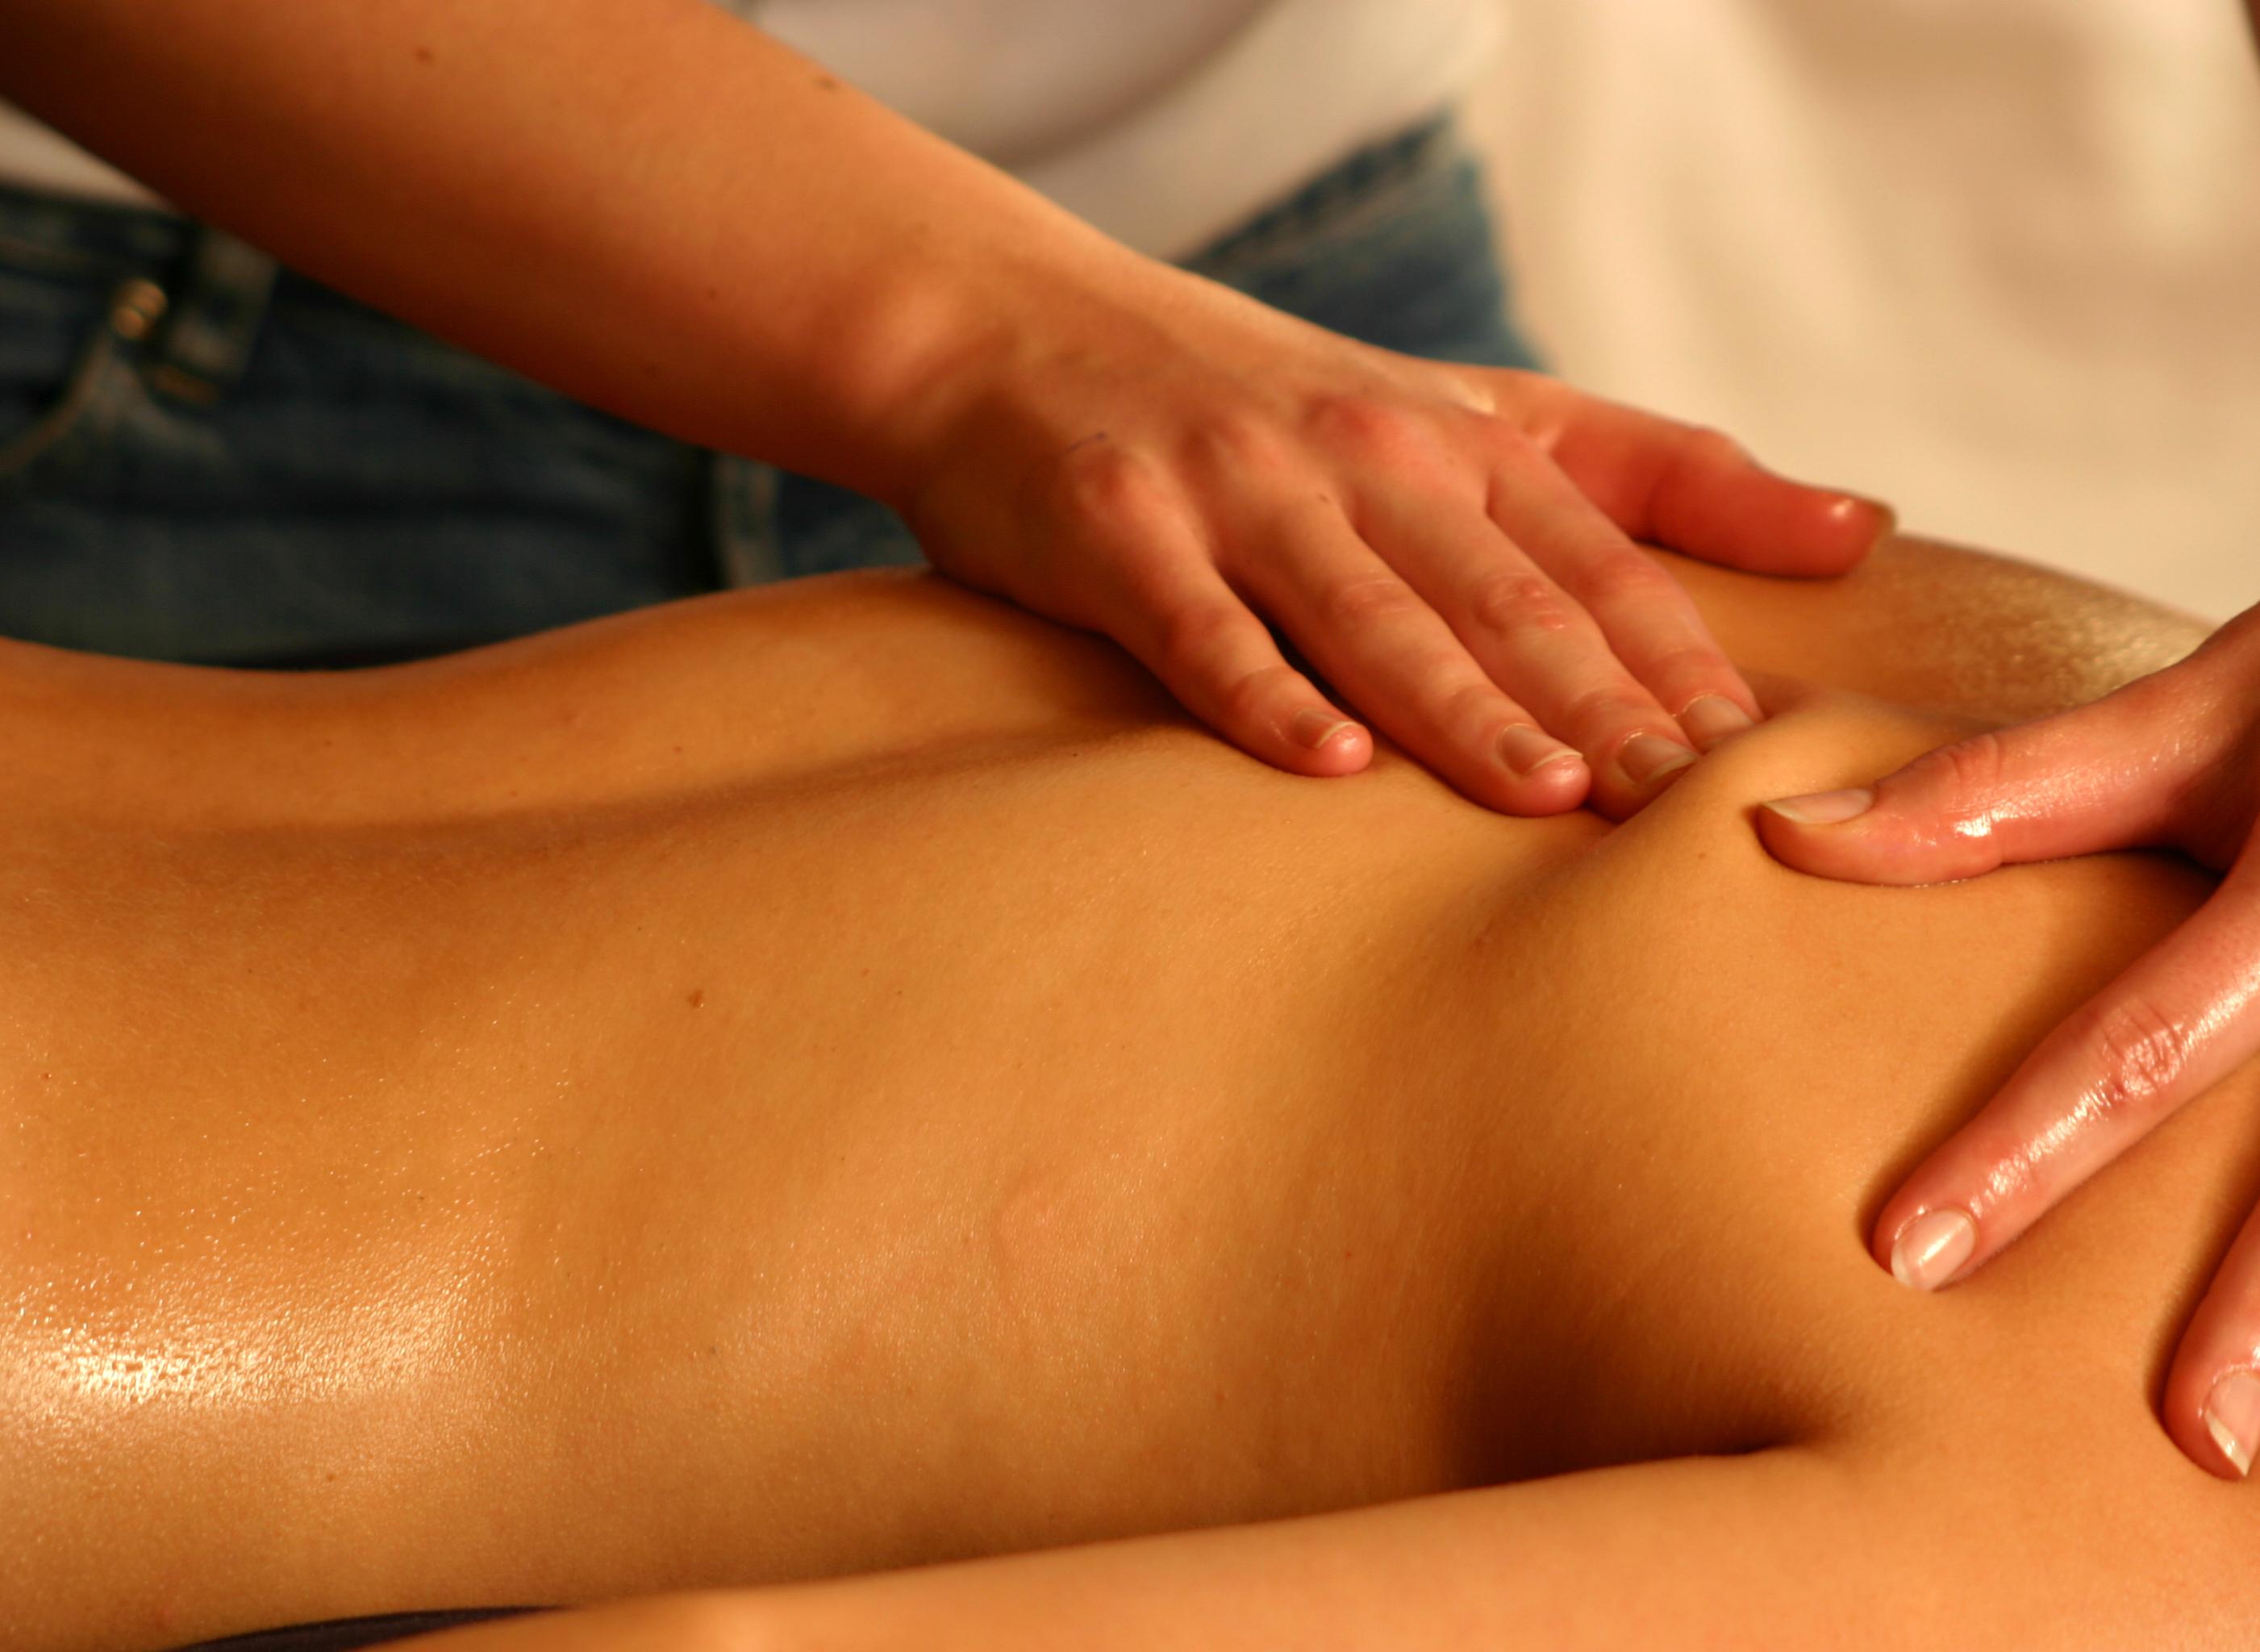 Самомассаж клитора у женщин фото 724-844